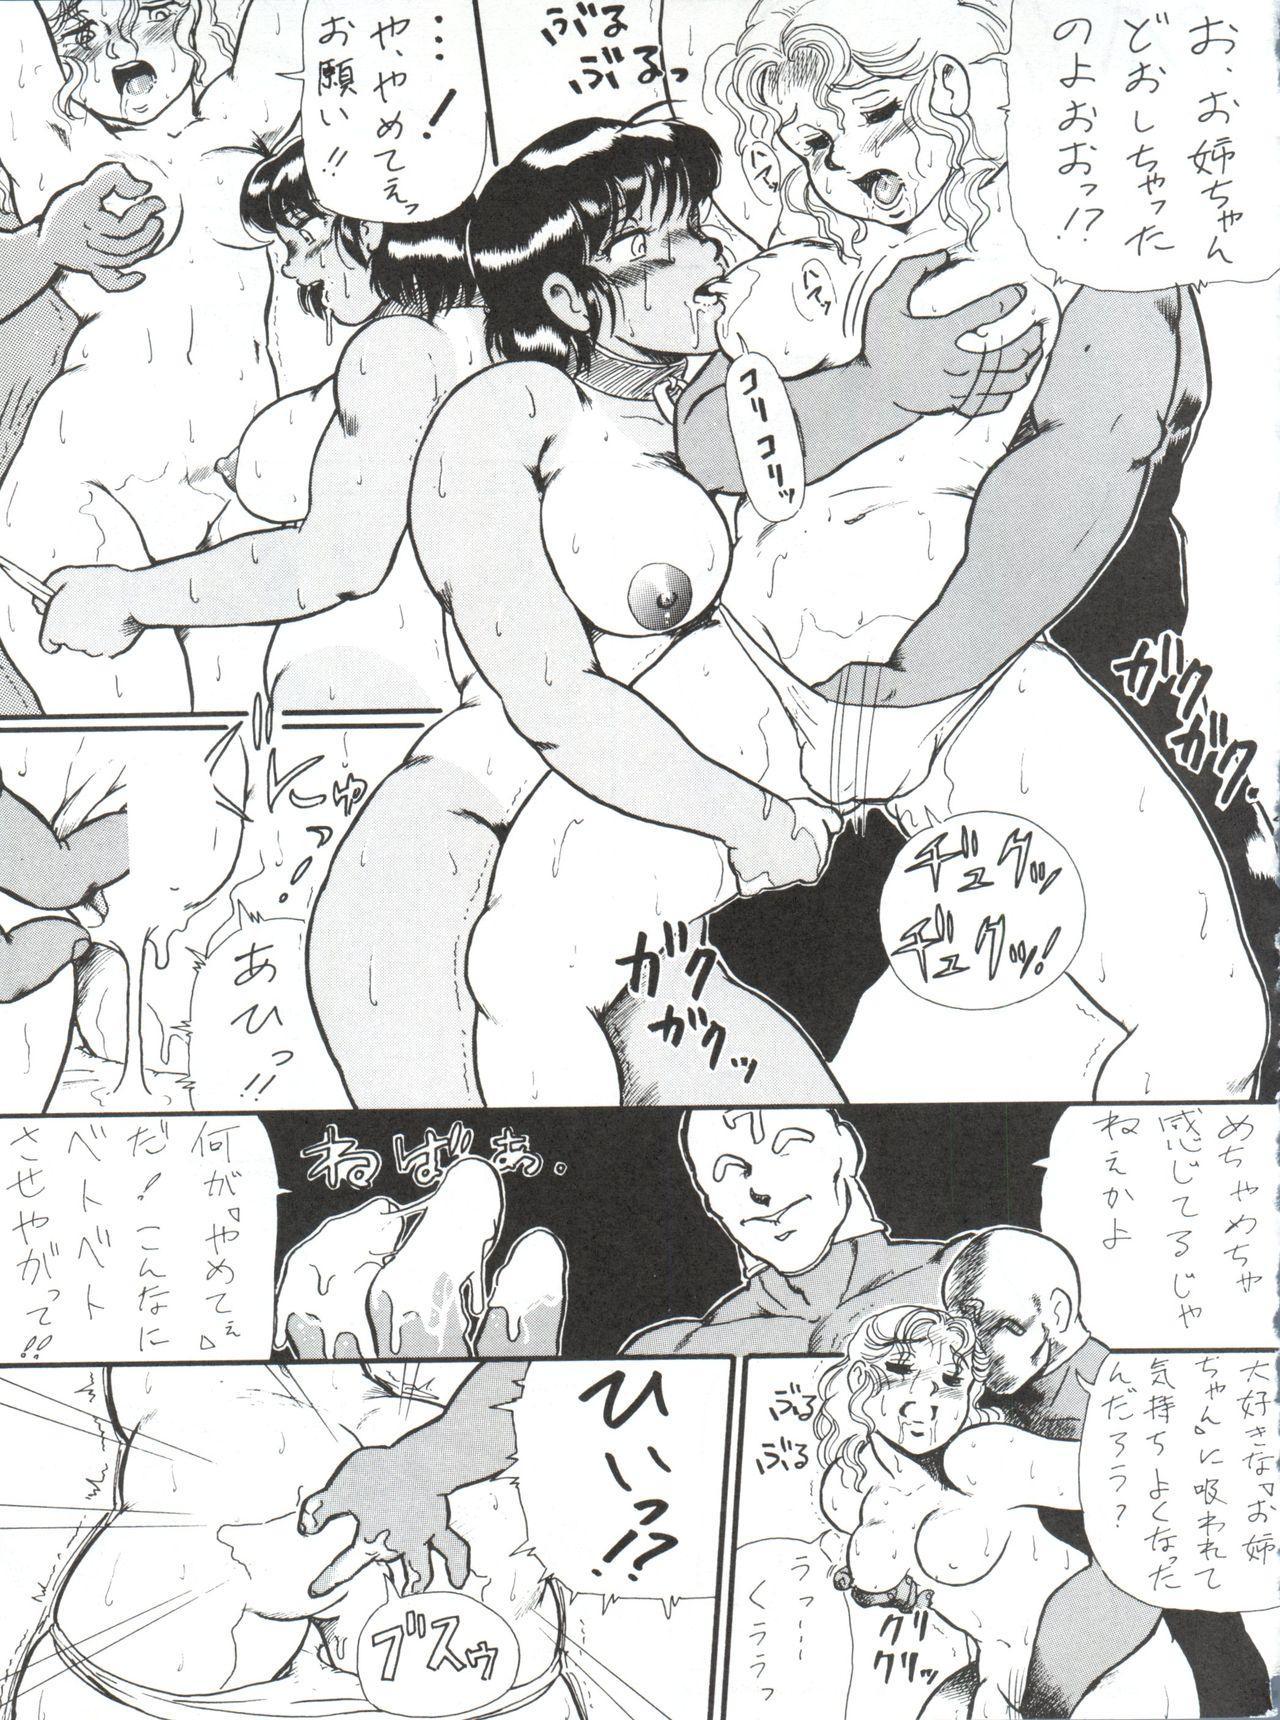 BLOOMAGAZINE Vol. 4 40